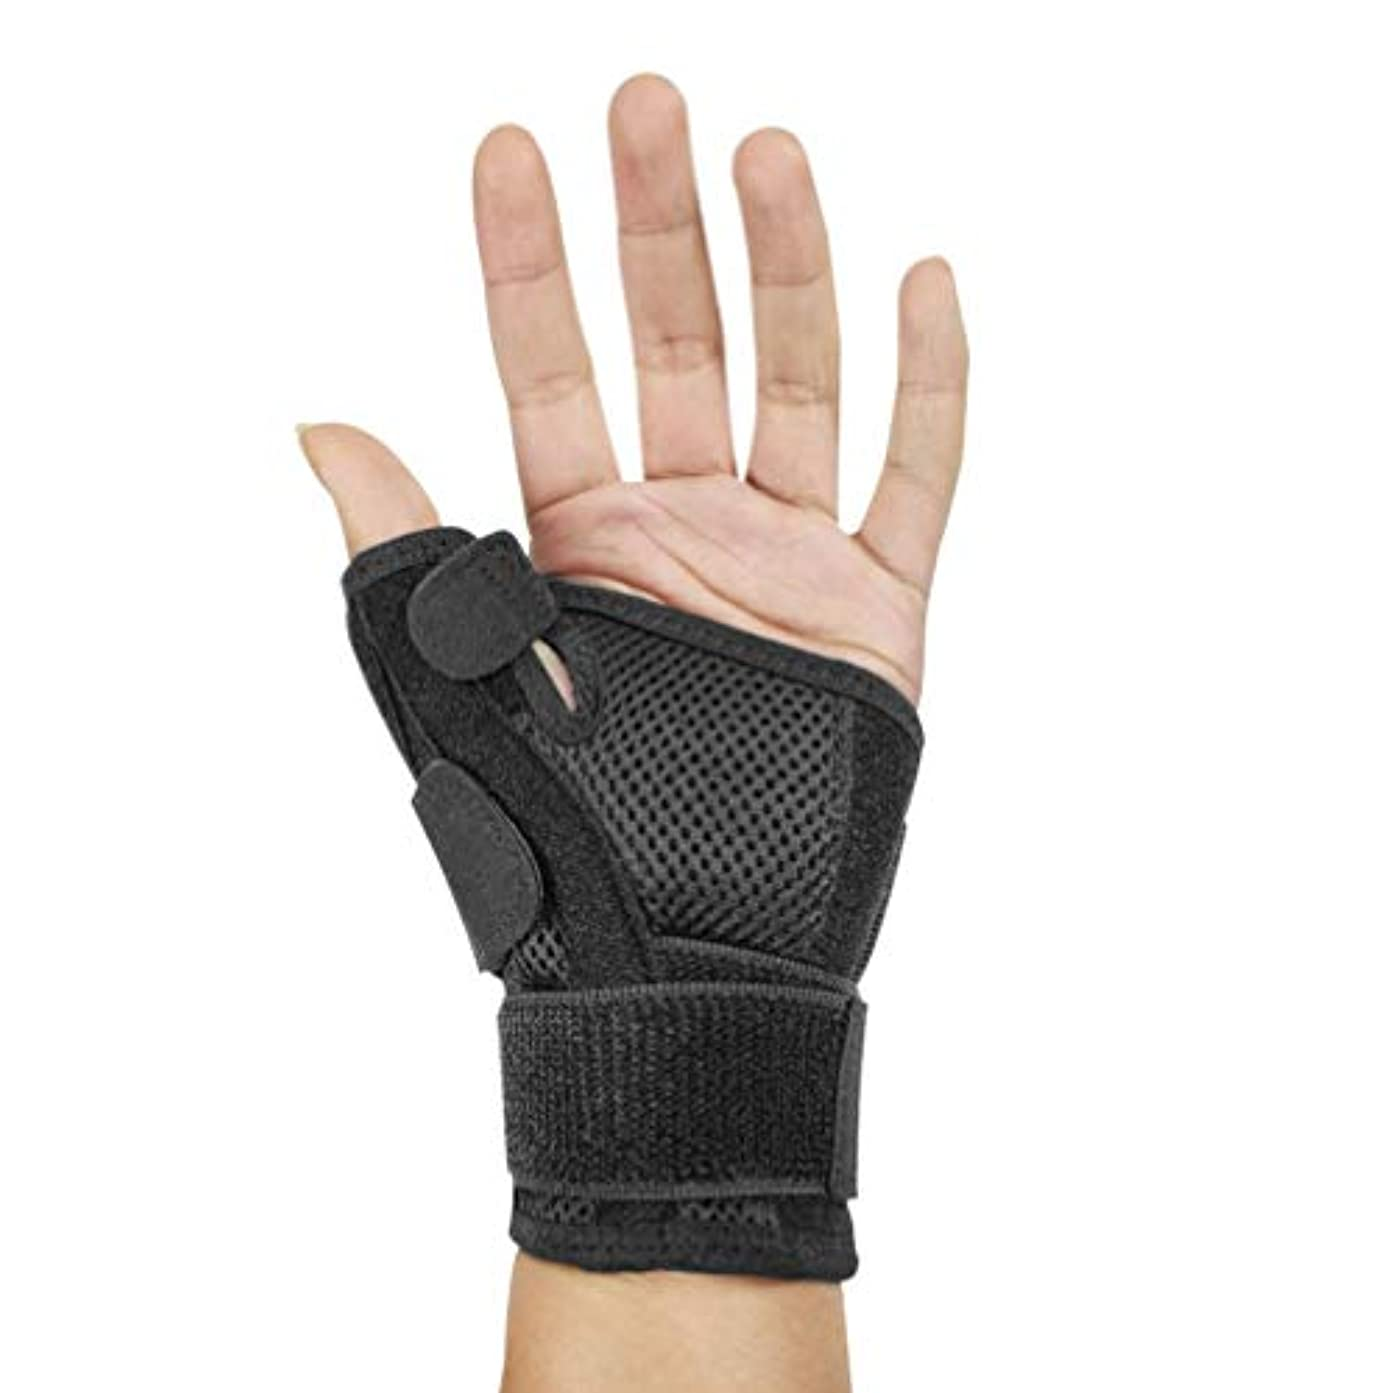 Healifty 手首用サポーター 手首固定 調節可能 スポーツ 手首サポート 女性 男性